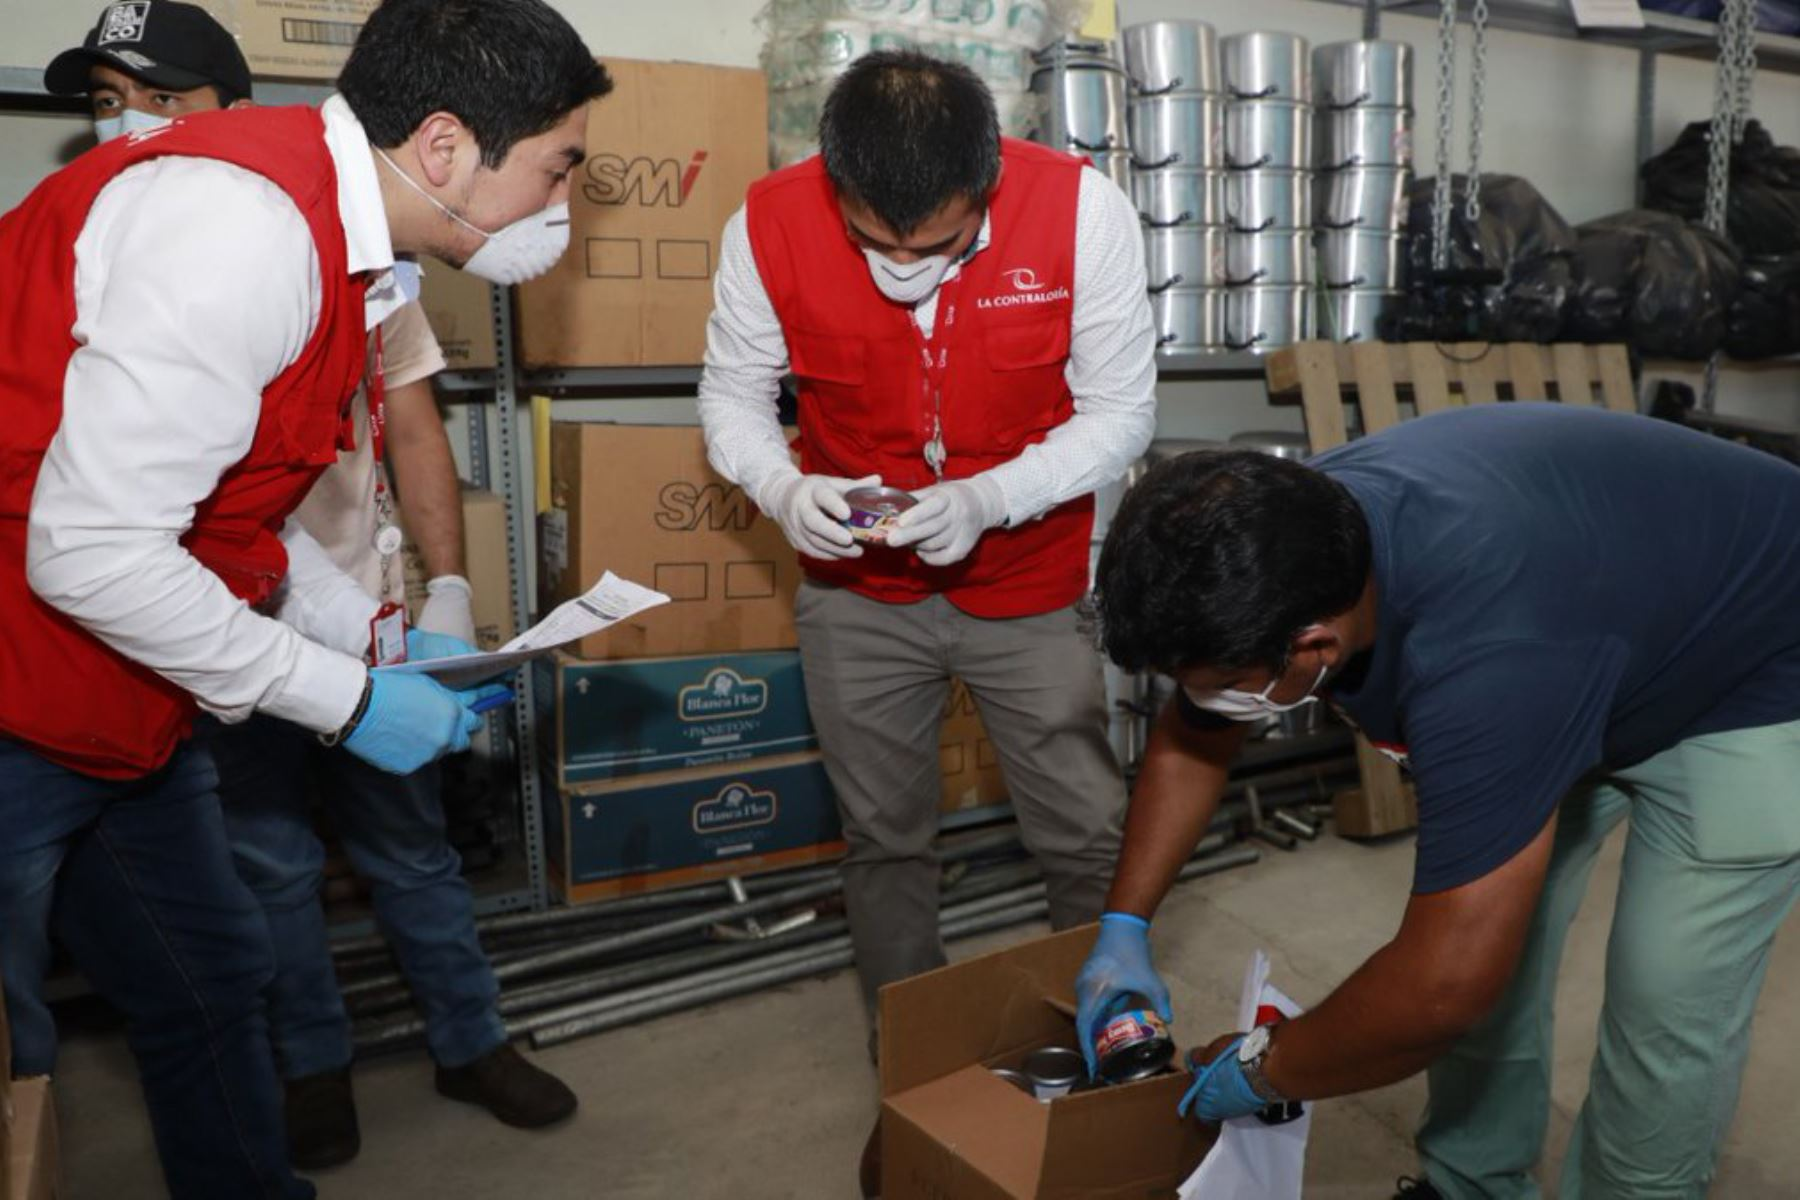 Contraloría continúa supervisión de entrega de canastas de víveres en 12 municipios de Lima y Callao como parte del Mega Operativo Emergencia Sanitaria2020. Foto:ANDINA/Difusión